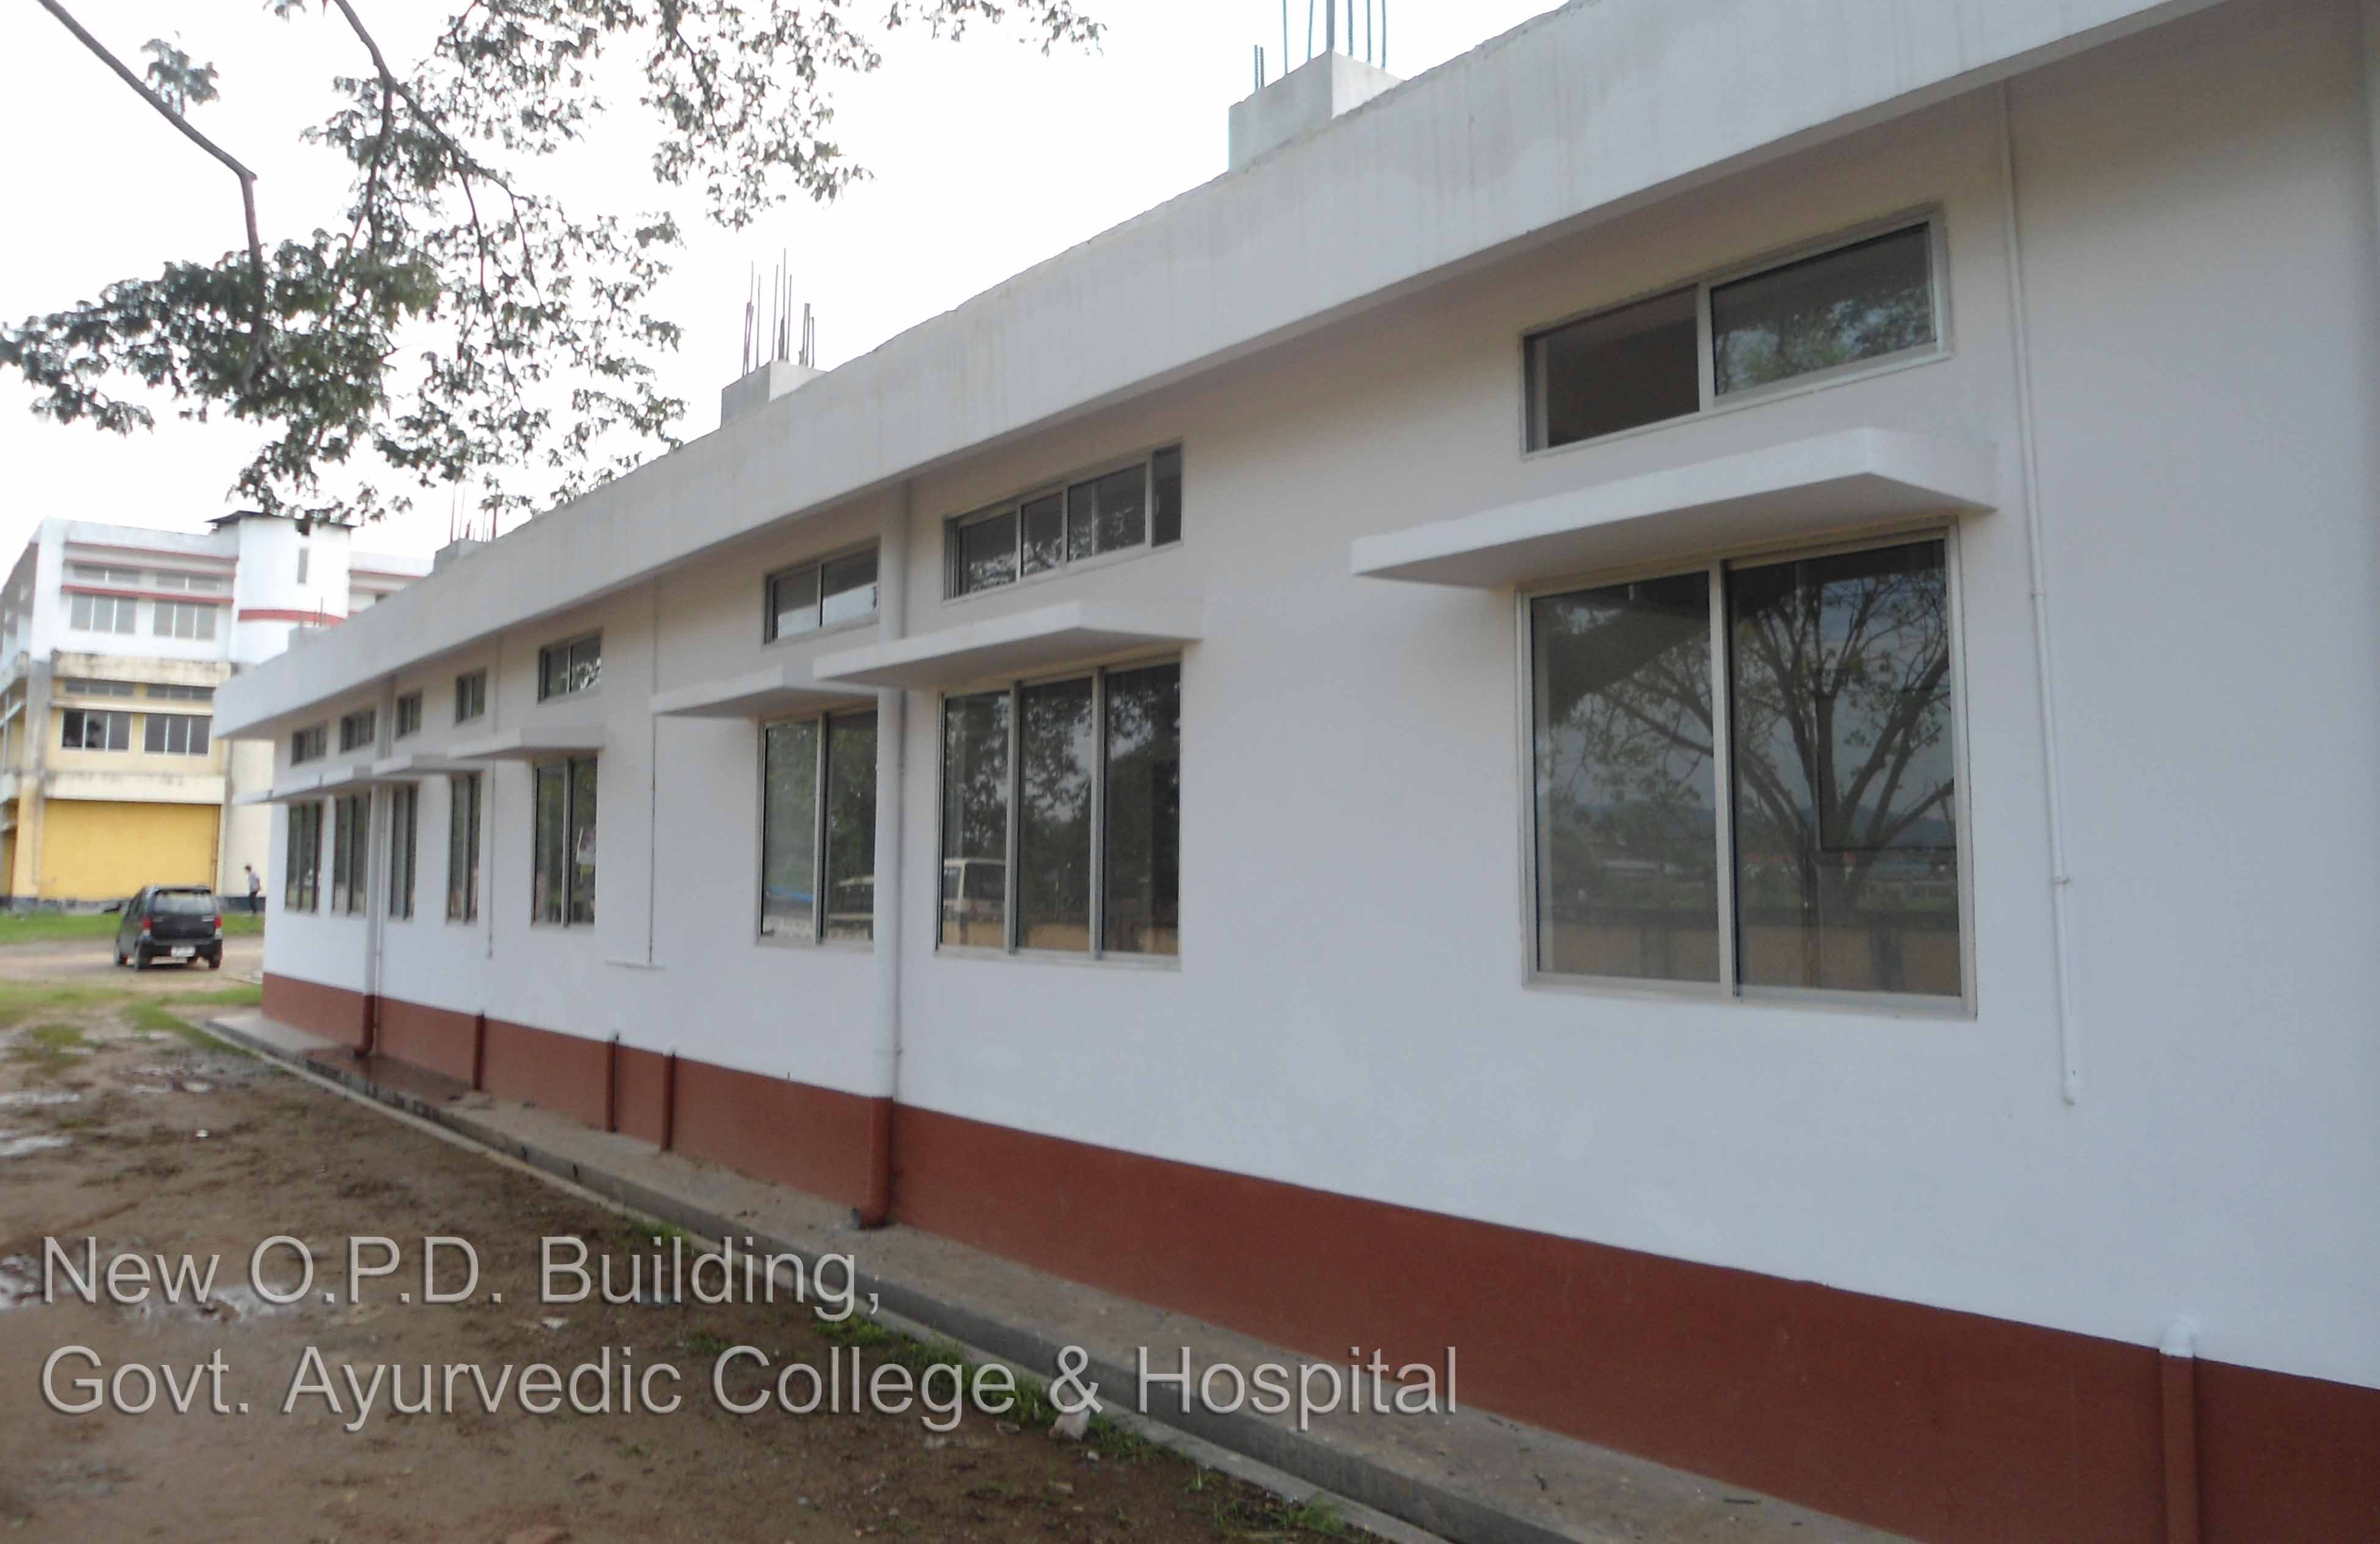 New O.P.D. Building